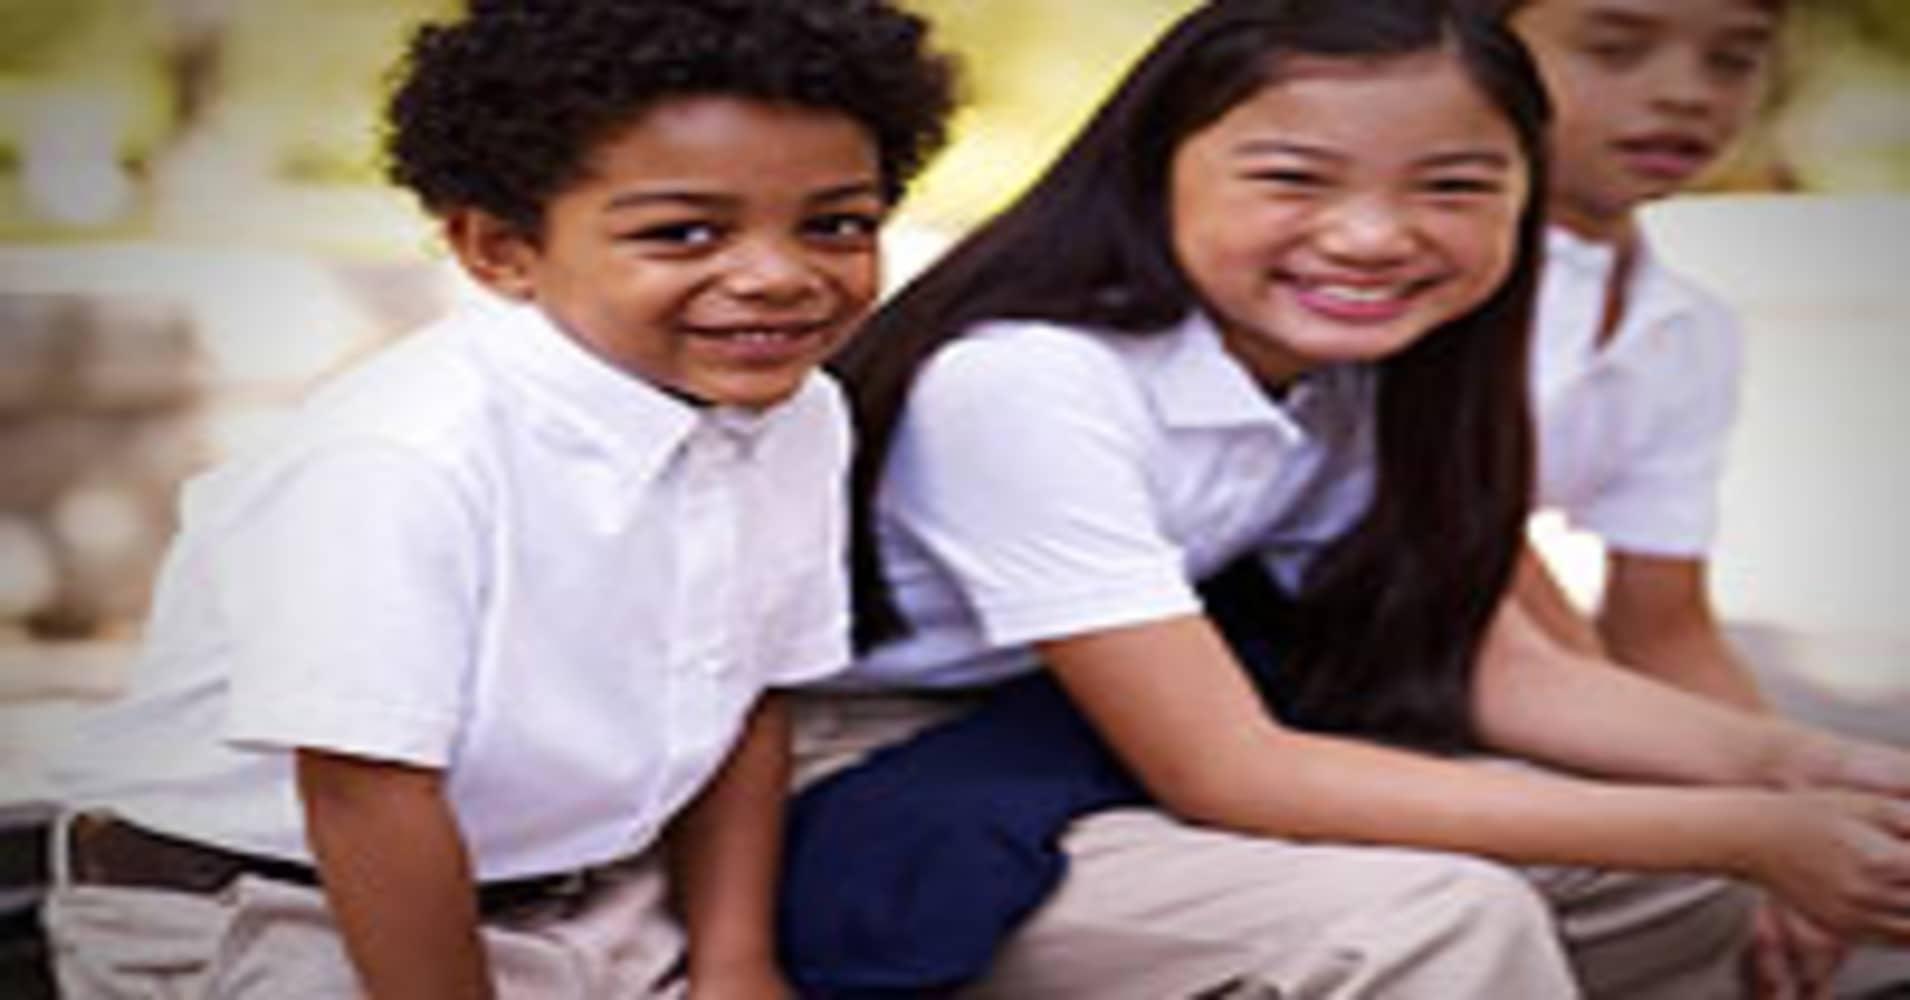 Uniforms Making the Grade at More Schools